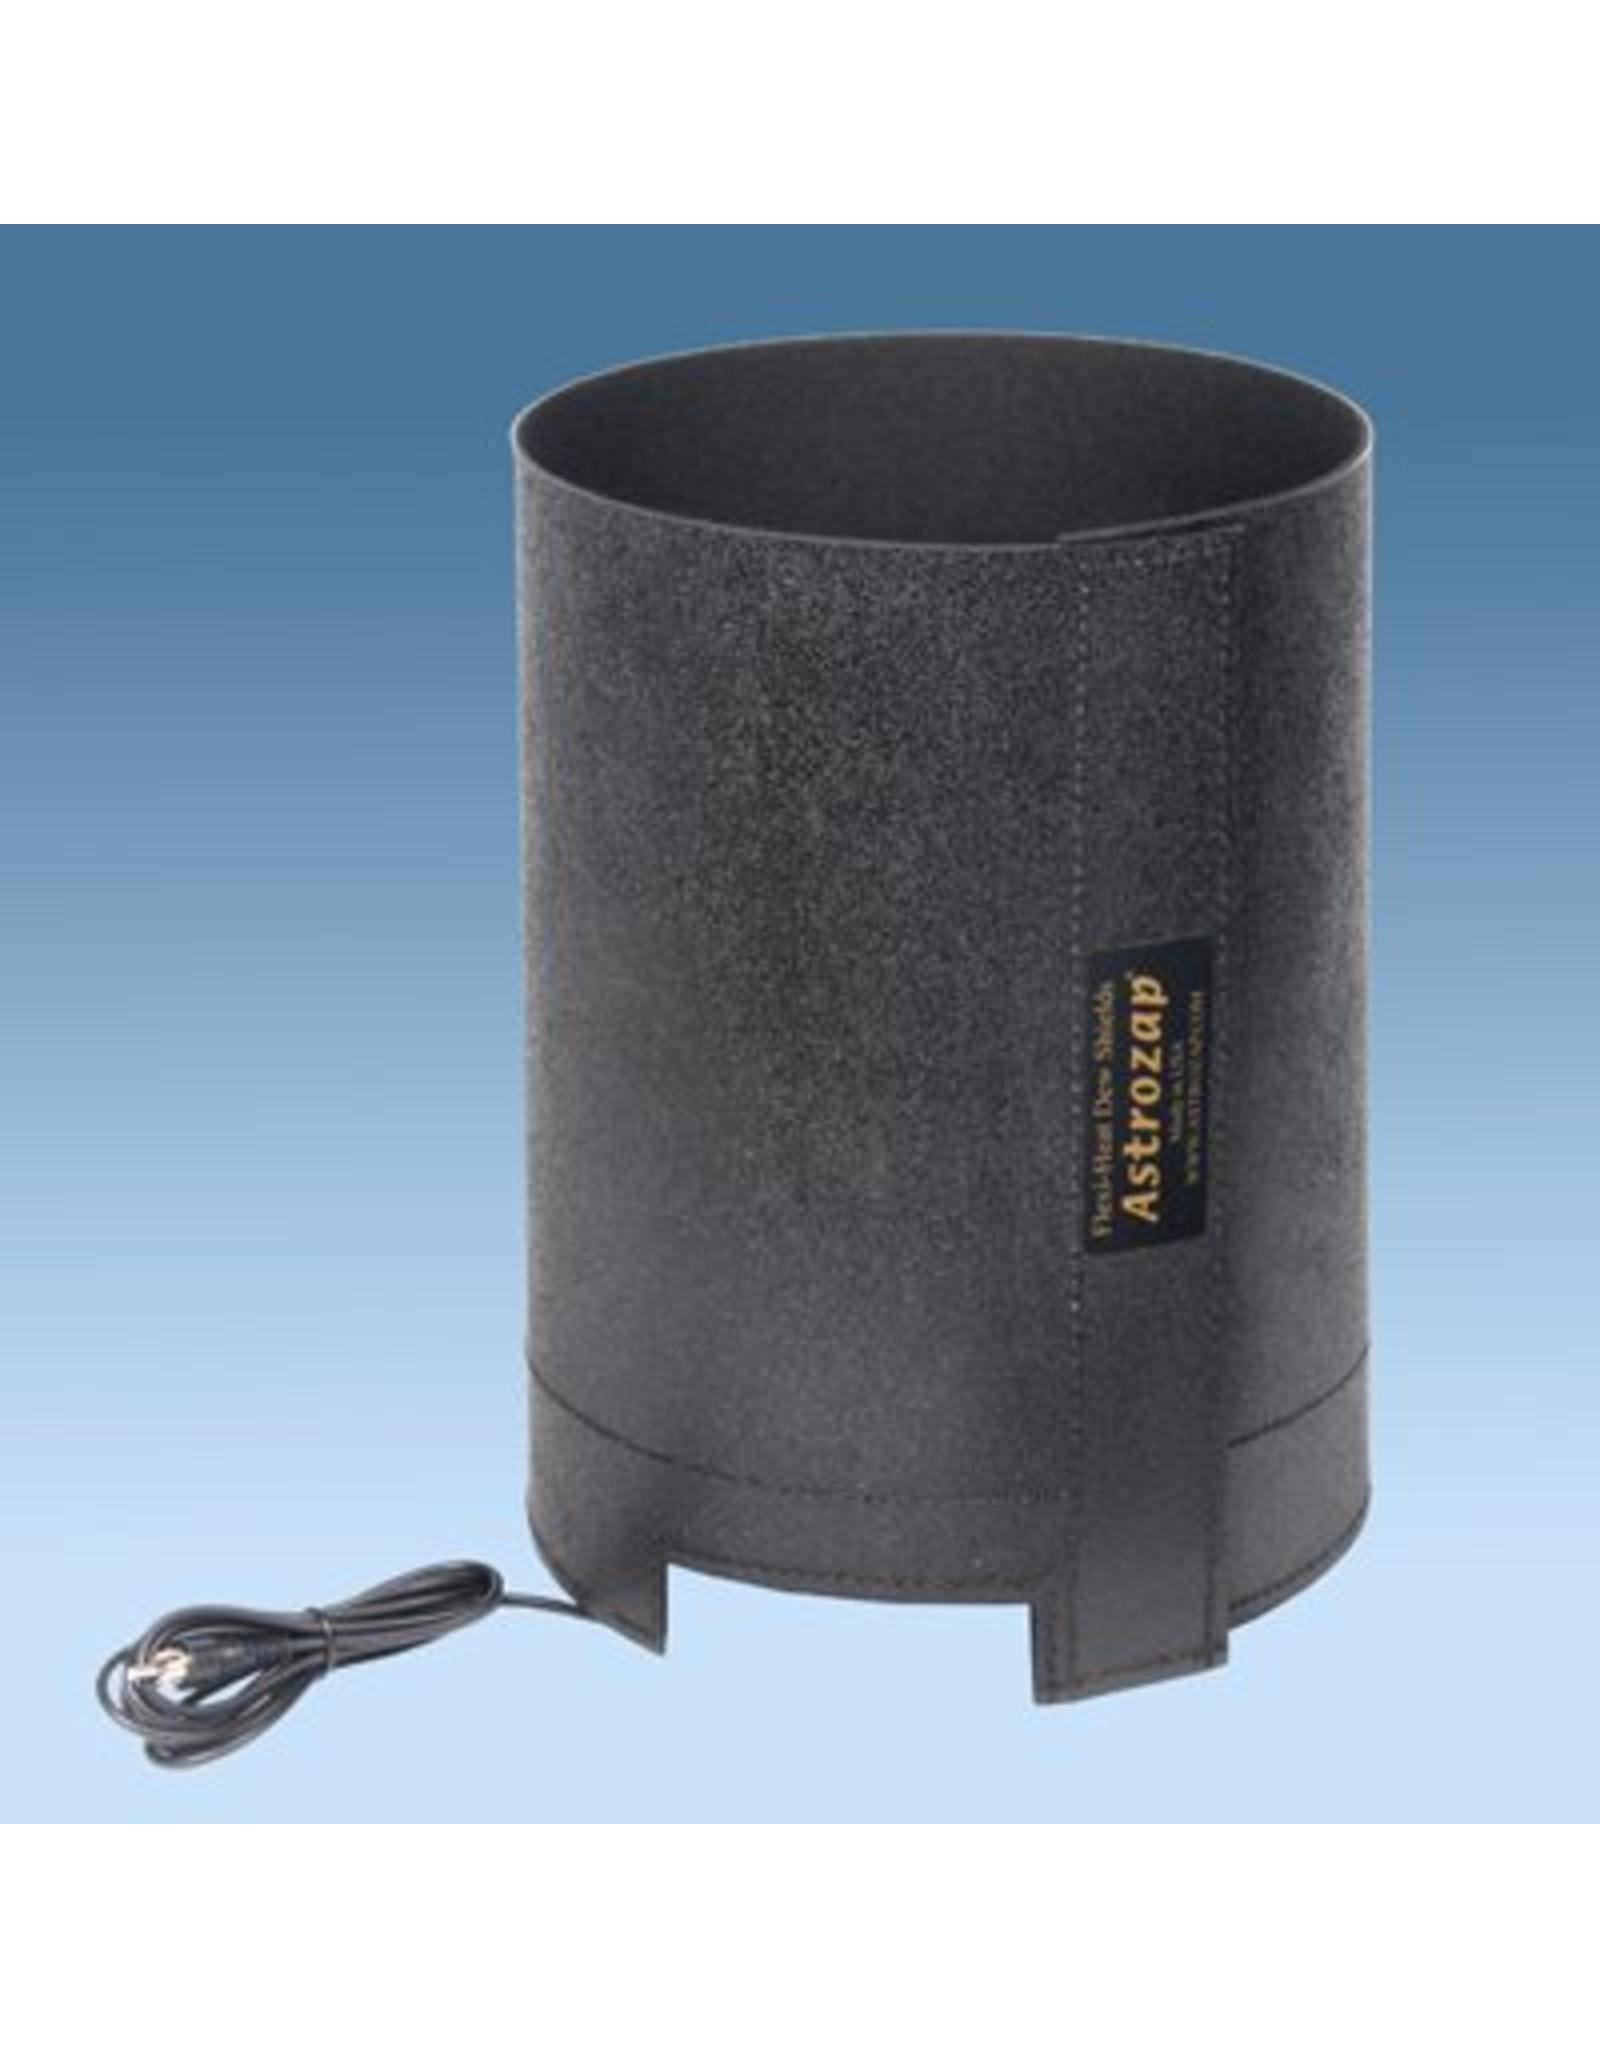 Astrozap AZ-809-N2 Flexi-Heat Celestron 9.25 Sct CGE & HD Dew Shield (Two notches)